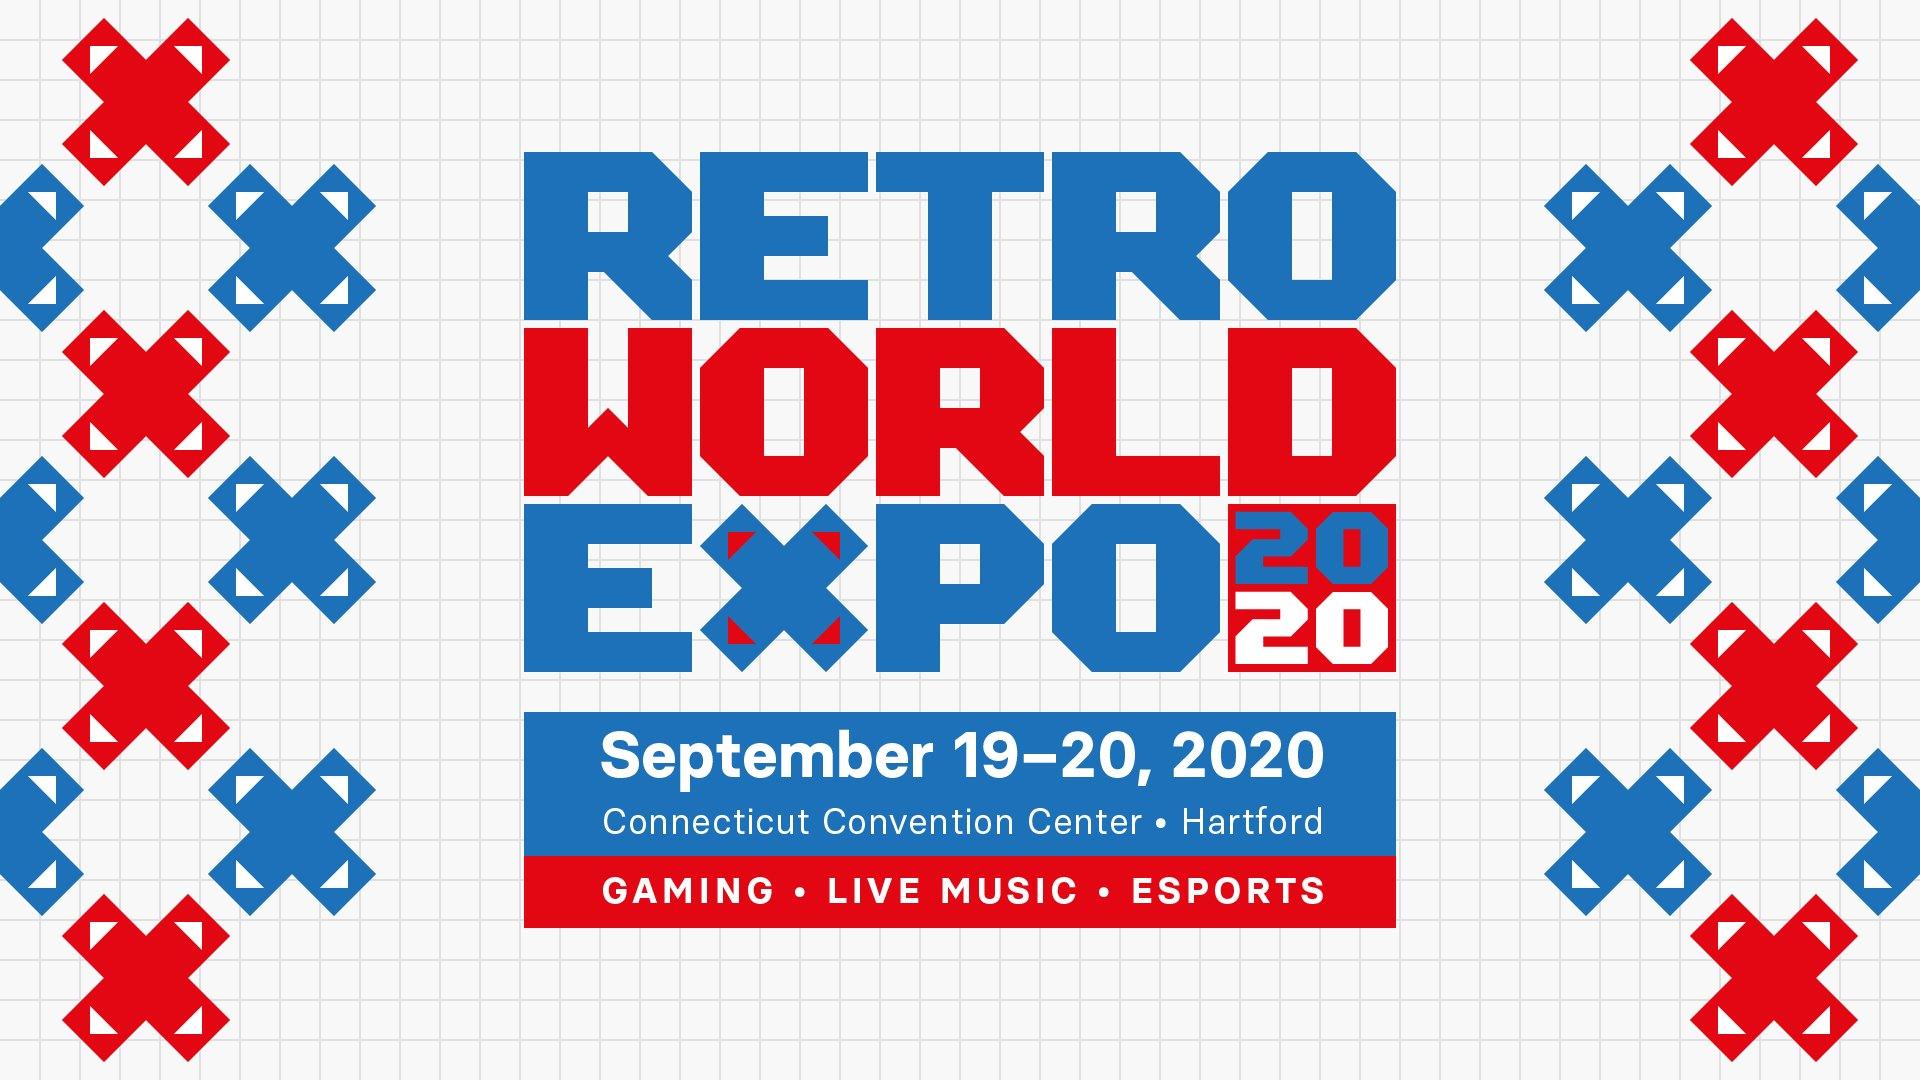 RetroWorld Expo (RTX) 2020 - Hartford Expo Center